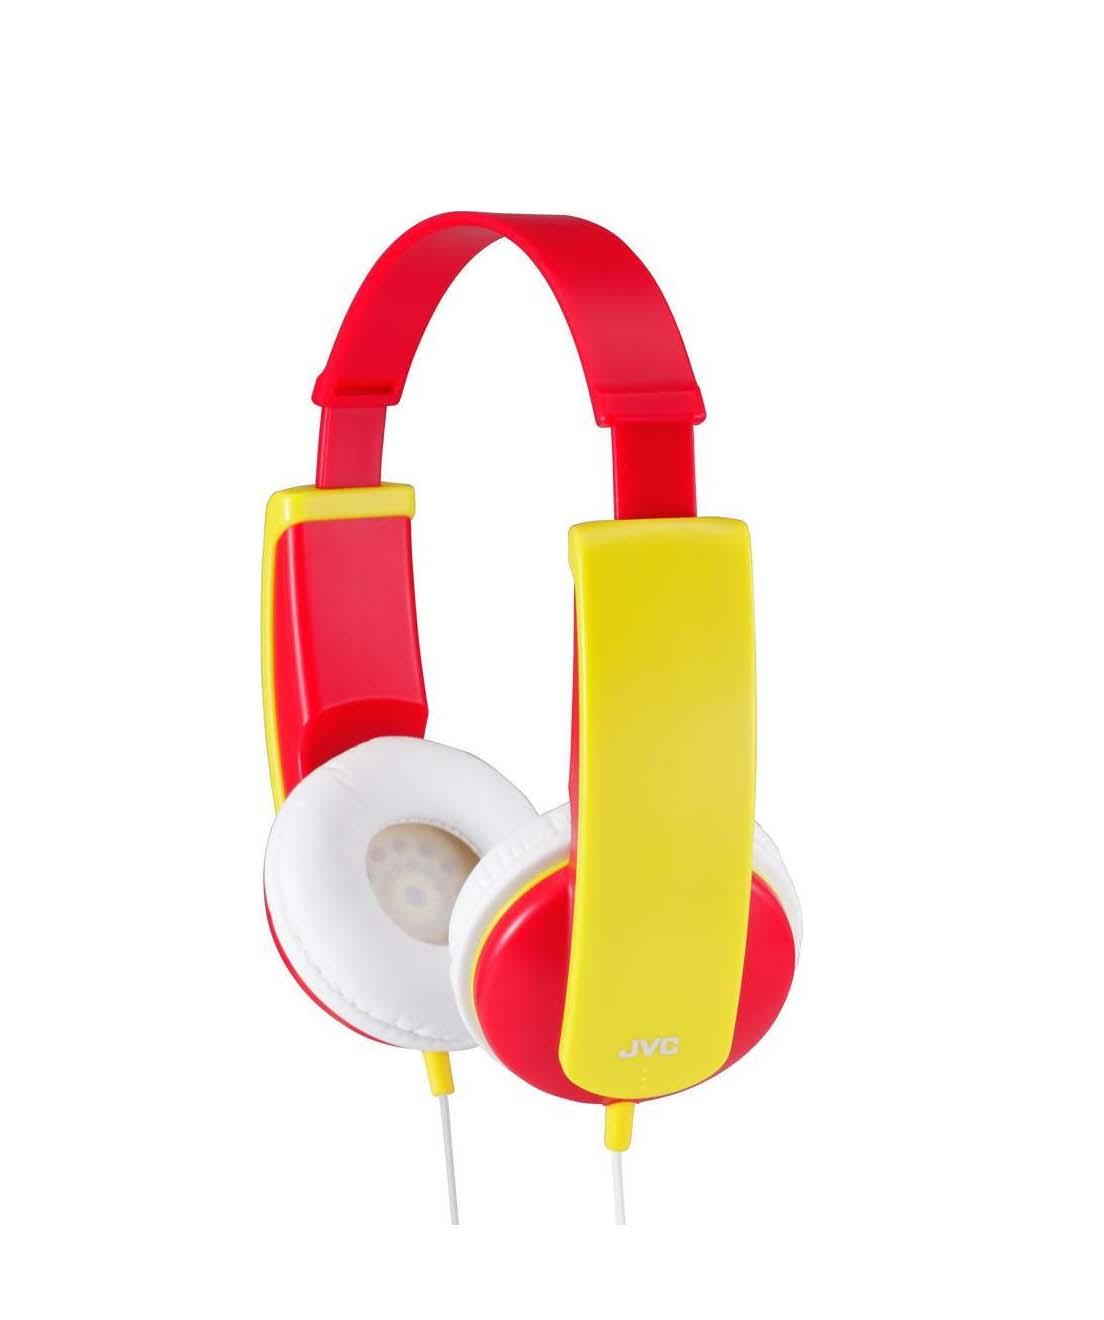 JVC HA-KD 5 R-E Red Headphones HAKD5R